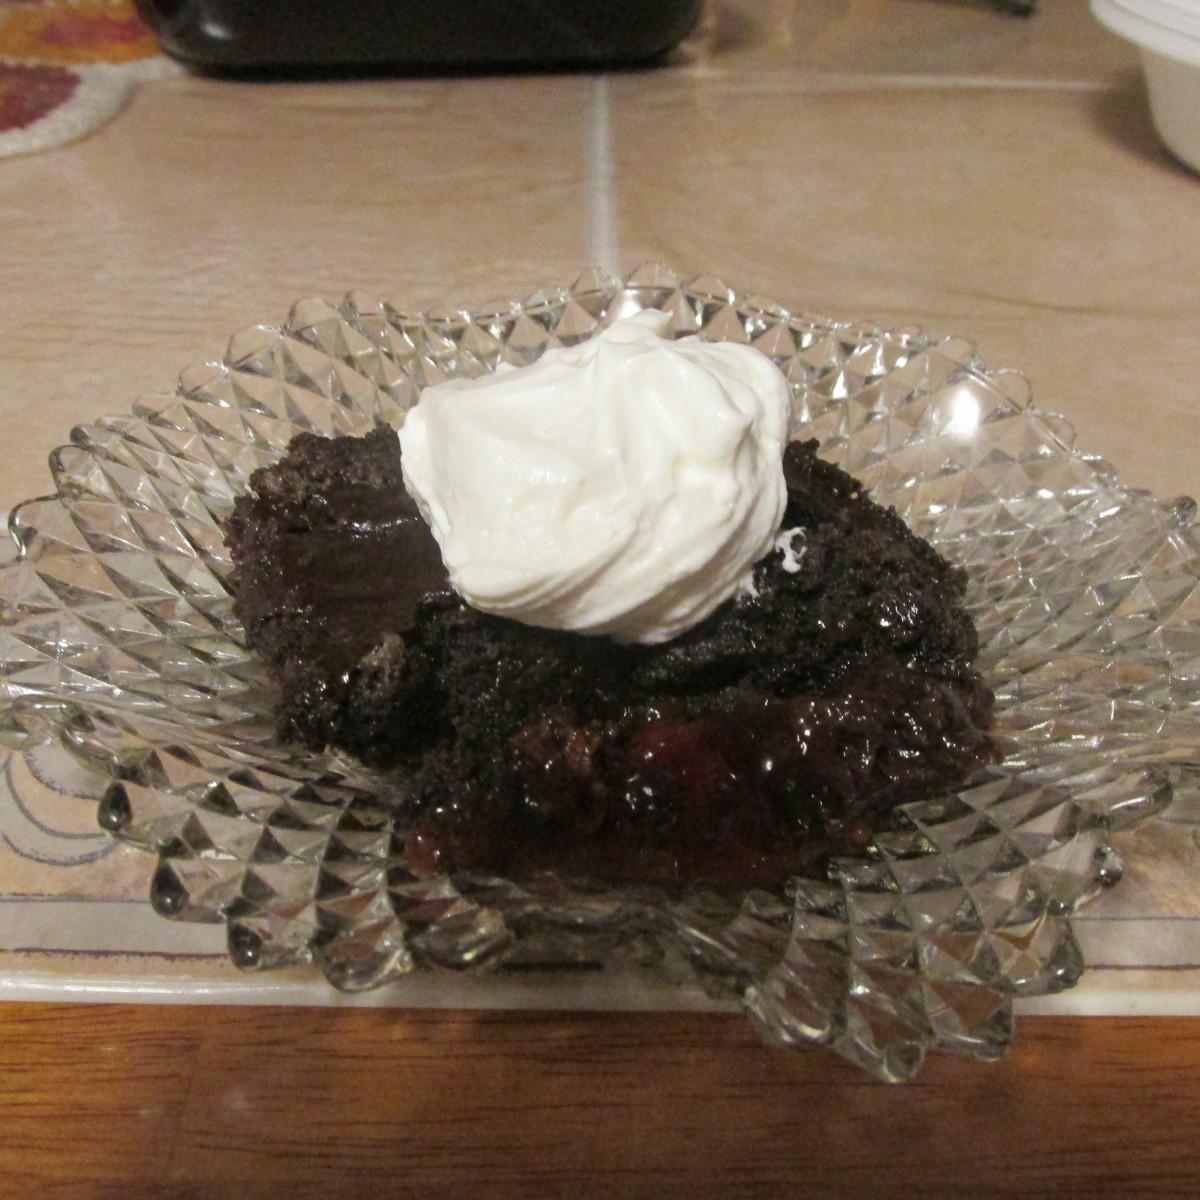 Black Forest dump cake ready to serve.